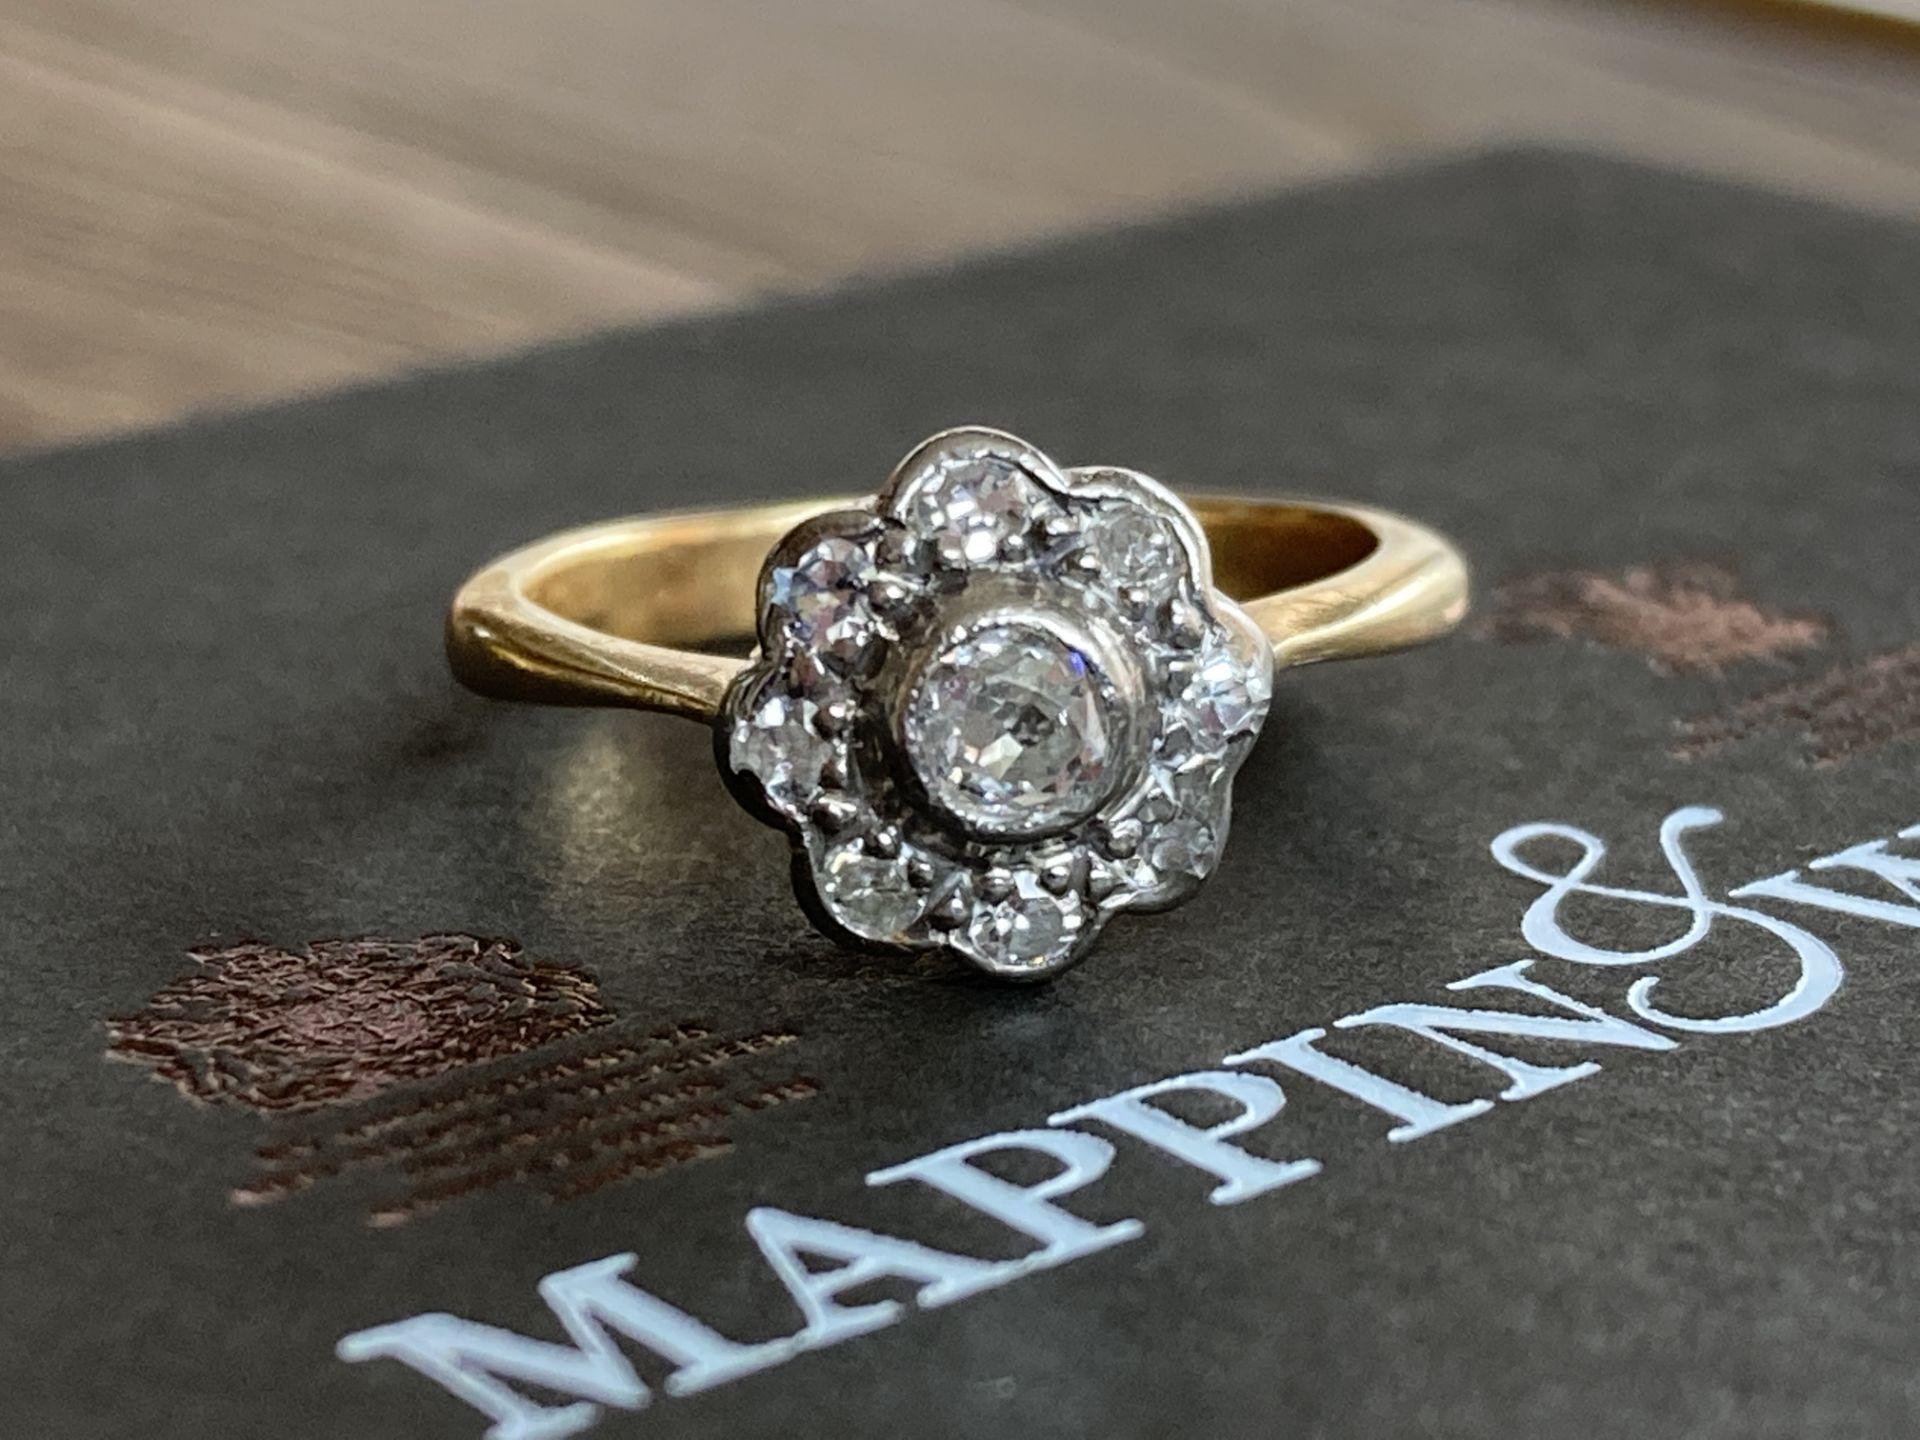 18CT GOLD 0.5CT DIAMOND RING